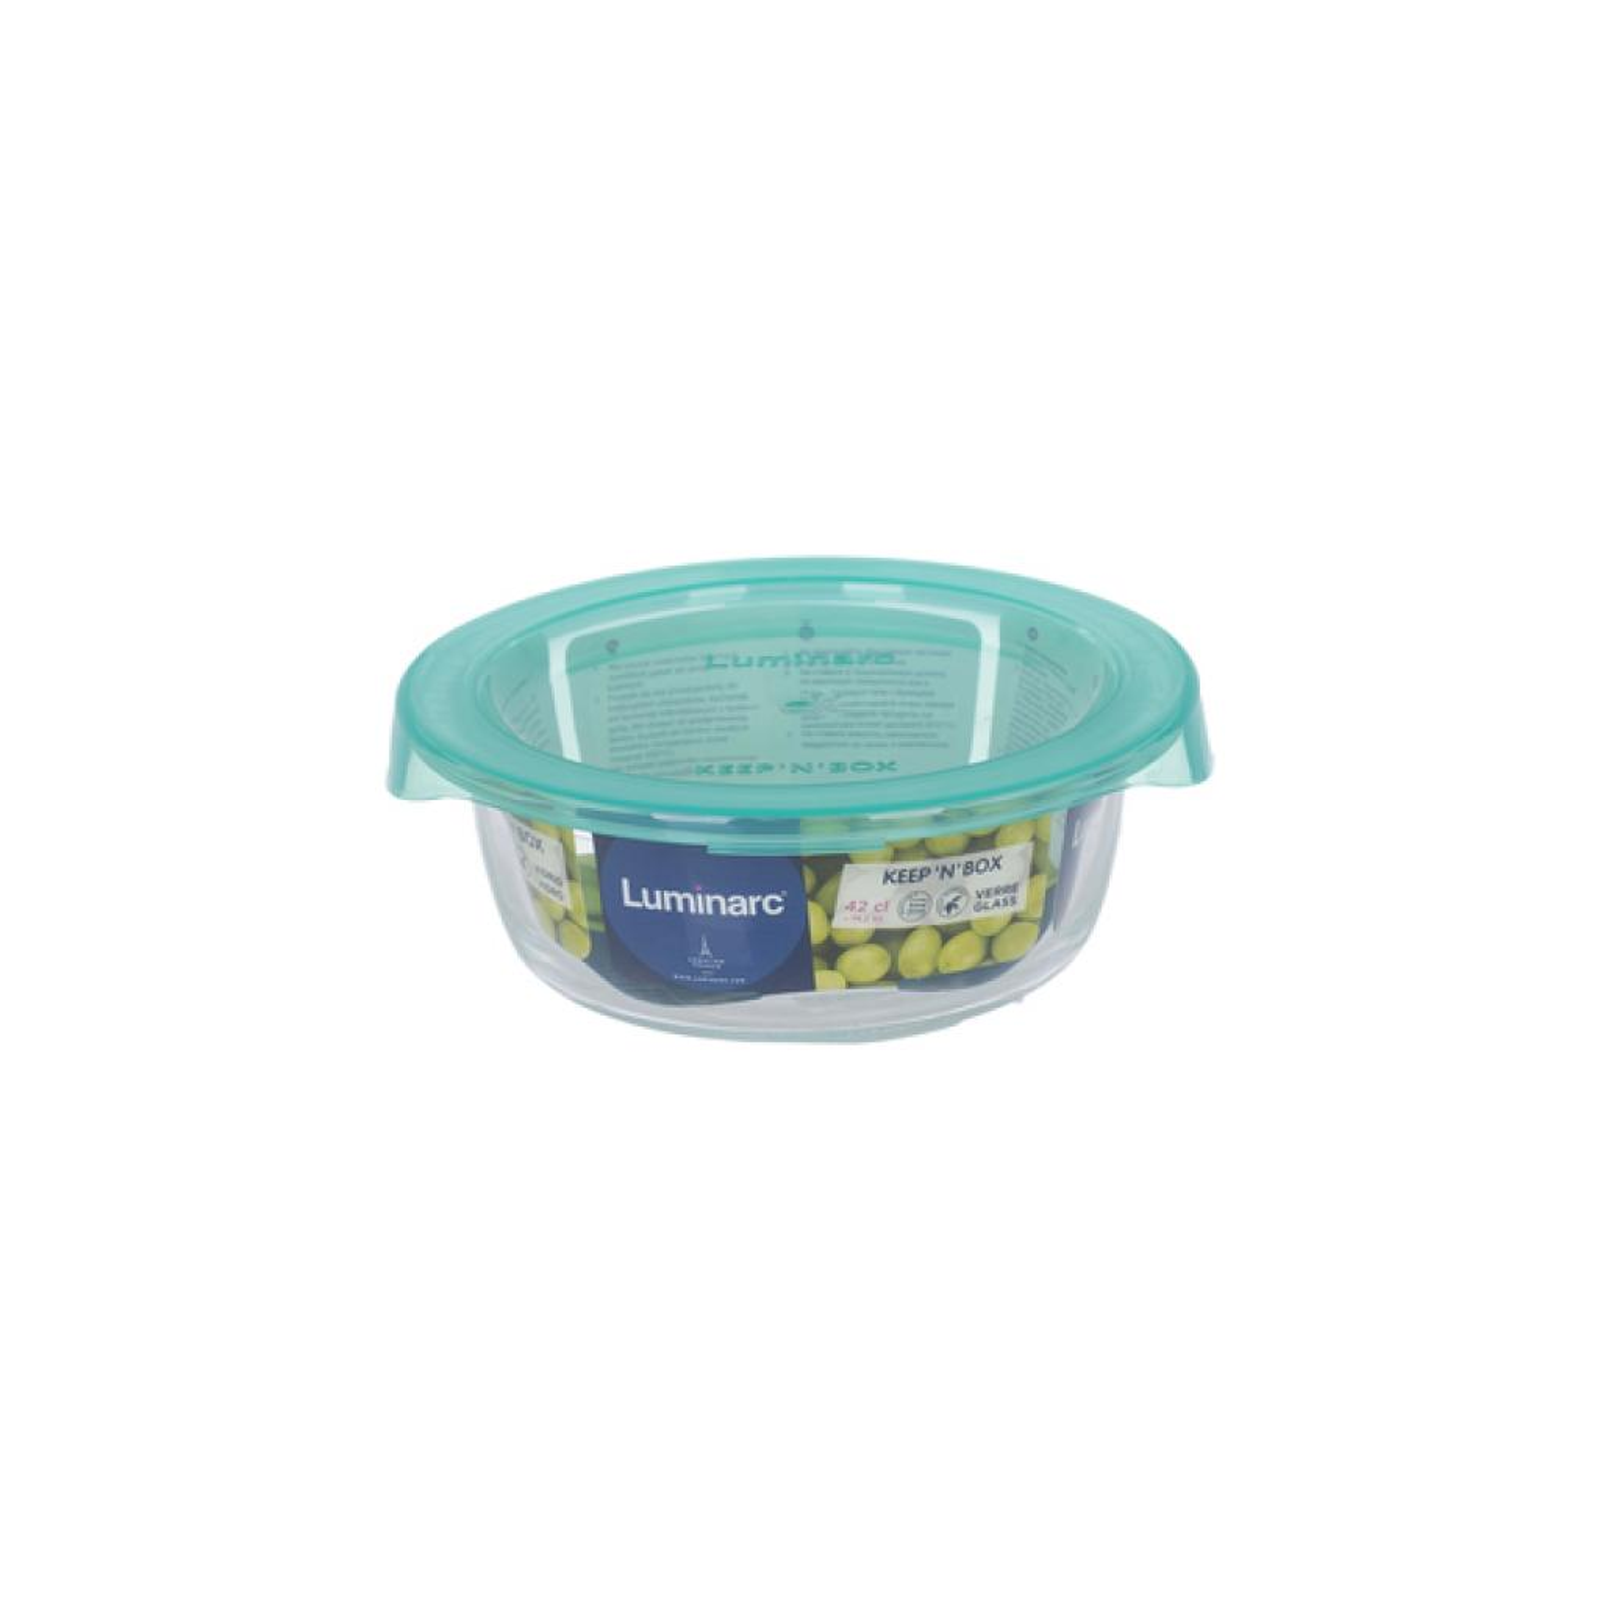 Пищевой контейнер Luminarc Keep'n Box Lagoon кругл. 420 мл (P5525) изображение 3